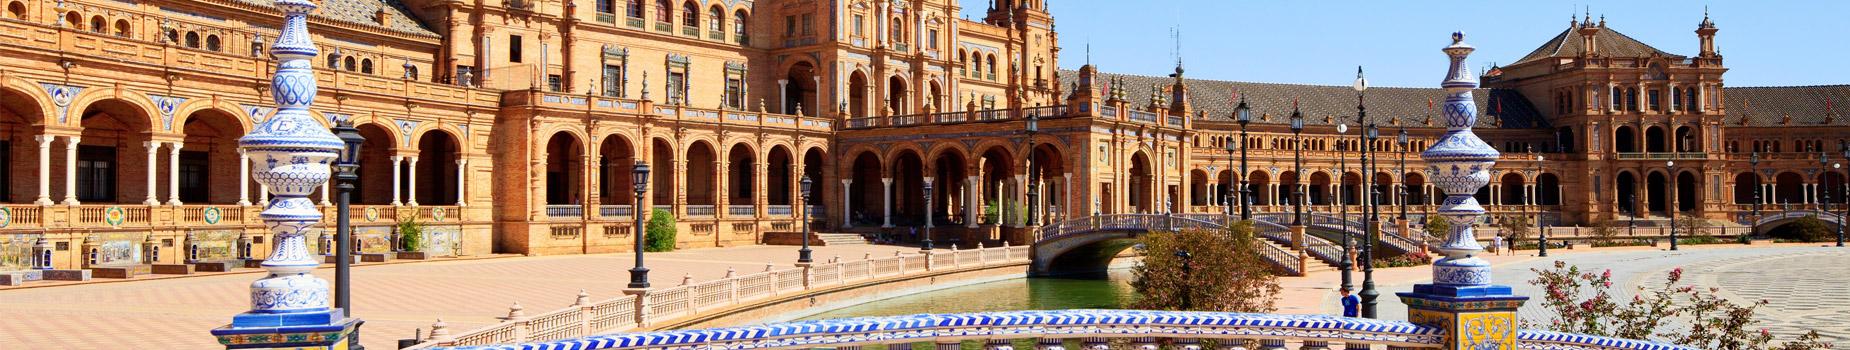 Plaza Espana in Andalusië